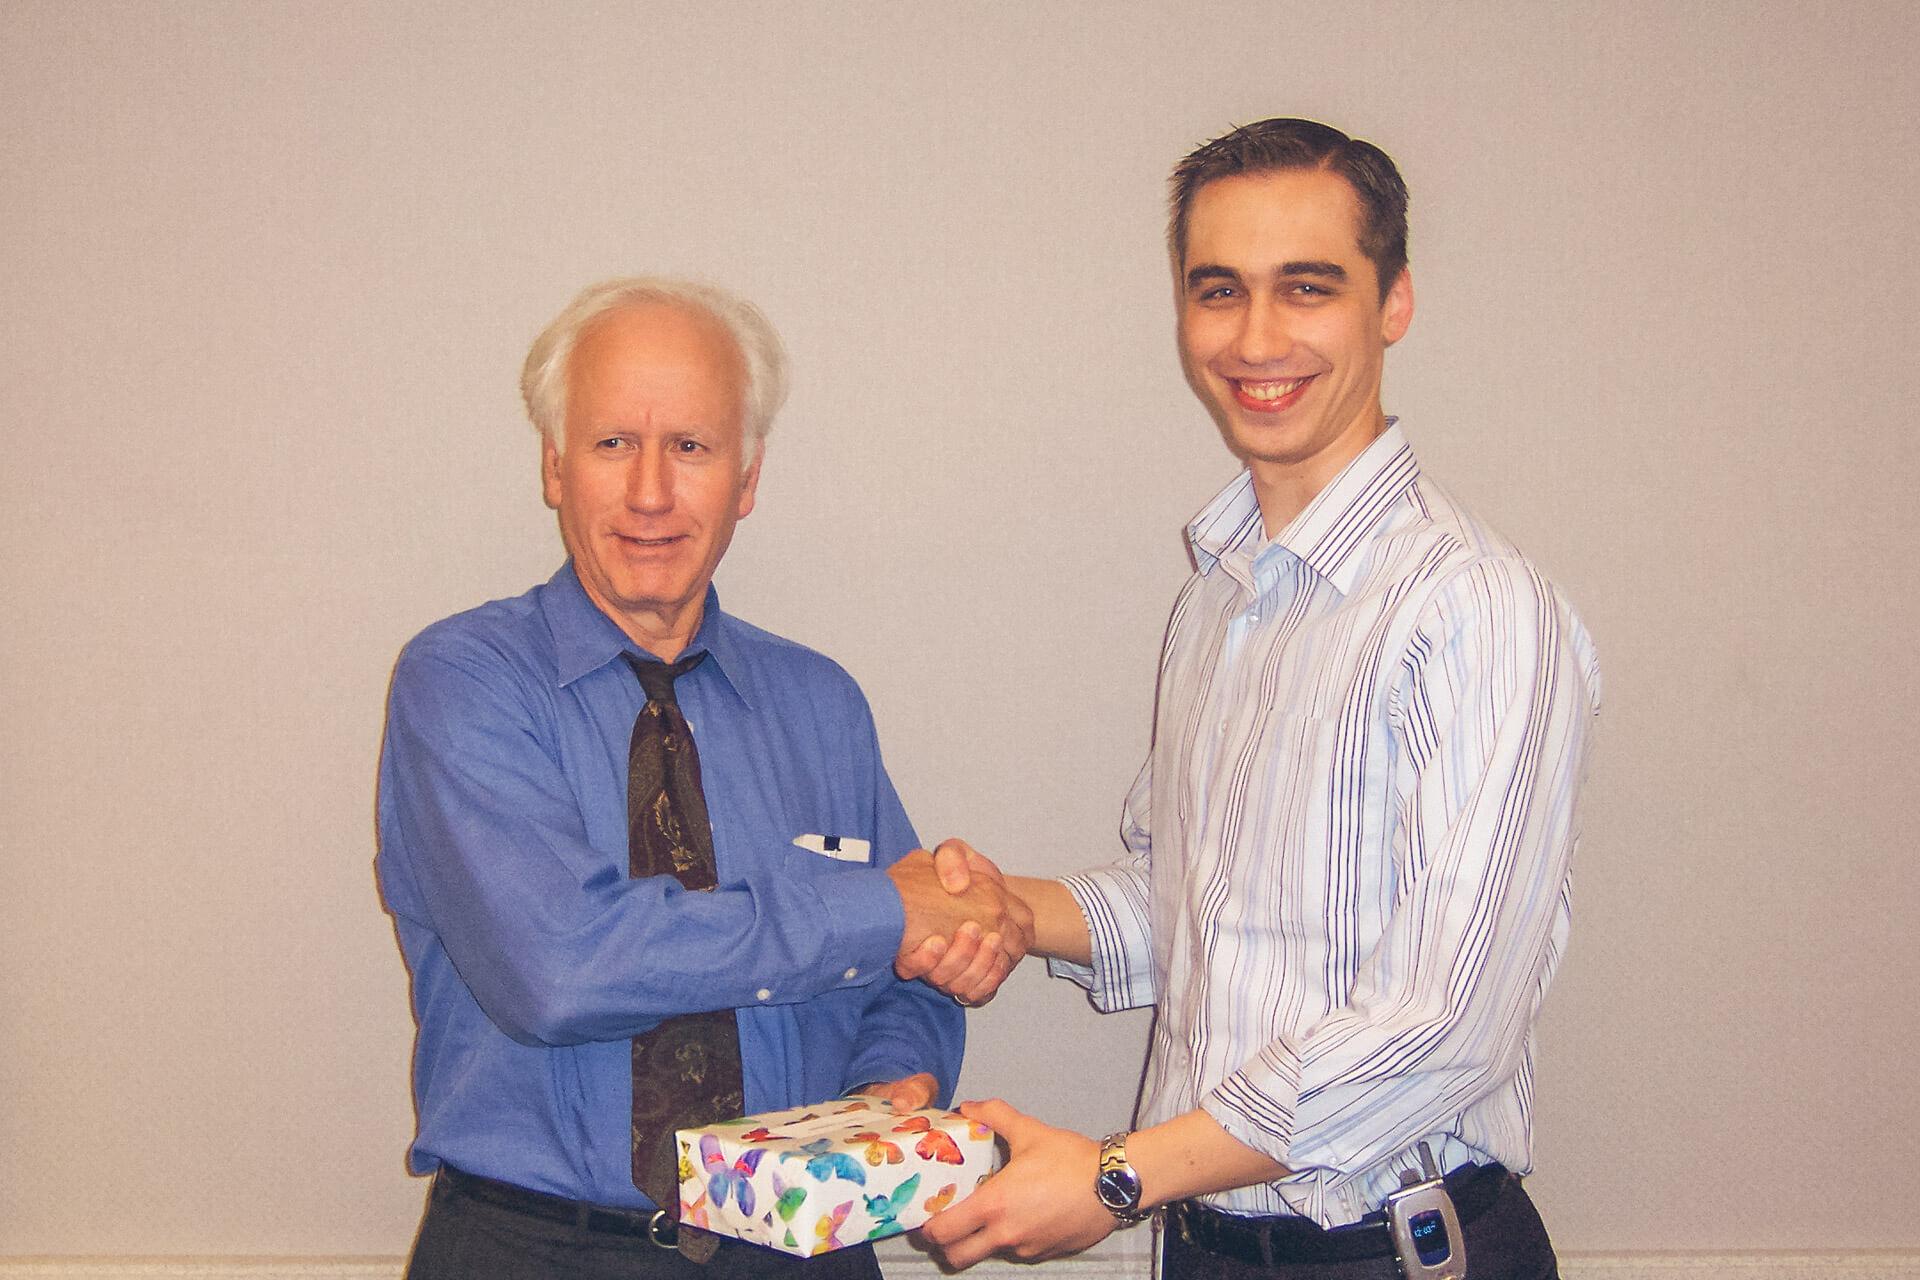 Clem McDonald Daniel Vreeman Fellowship